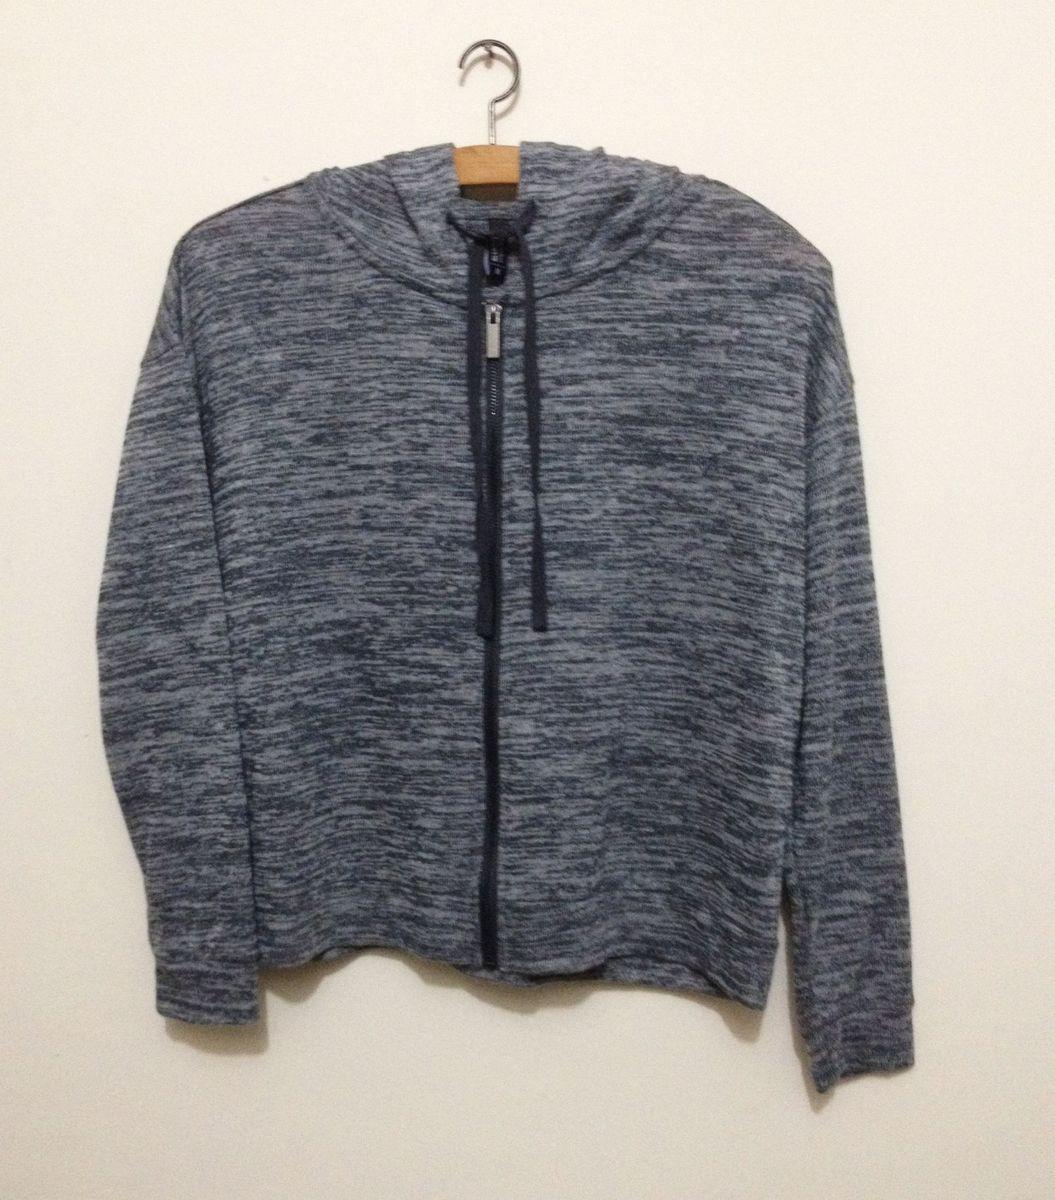 9ad97103e4bd6 ... blusa frio capuz - casaquinhos blue steel.  Czm6ly9wag90b3muzw5qb2vplmnvbs5ici9wcm9kdwn0cy83ntk2mde1lzeyzwm4ztg5zwuxmme3ngjhnzk3nmqymjdizgrhmti5lmpwzw  . ...